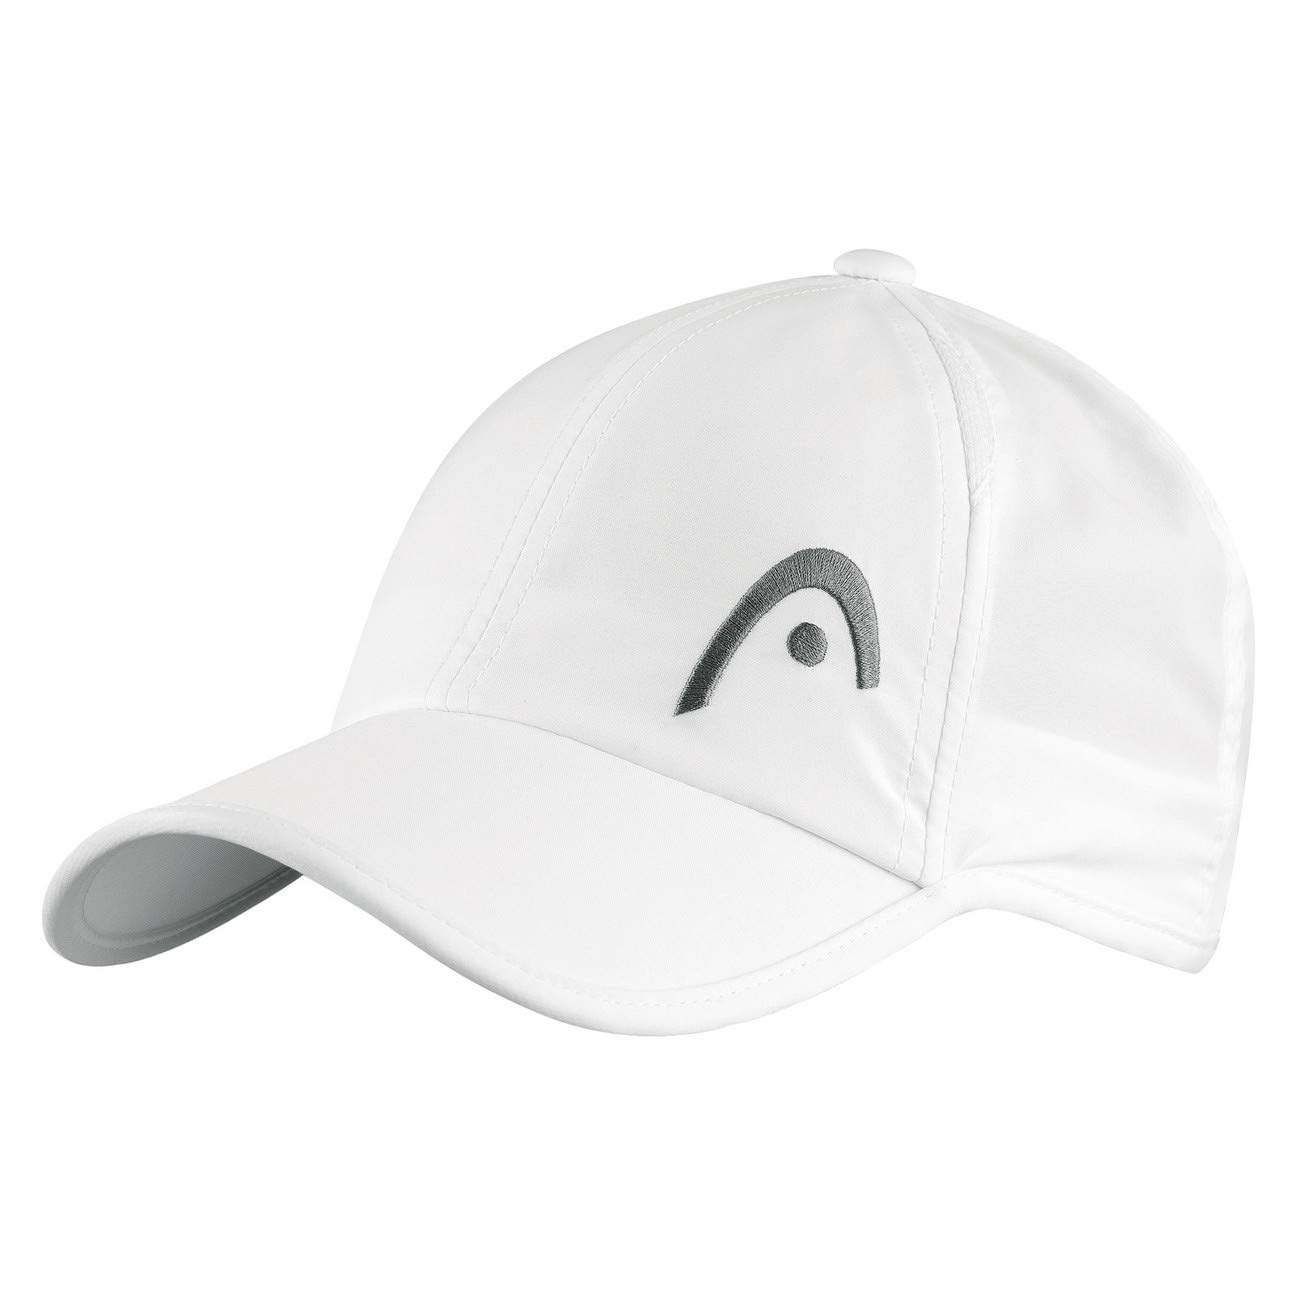 Head-Pro Player Tennis Hat-